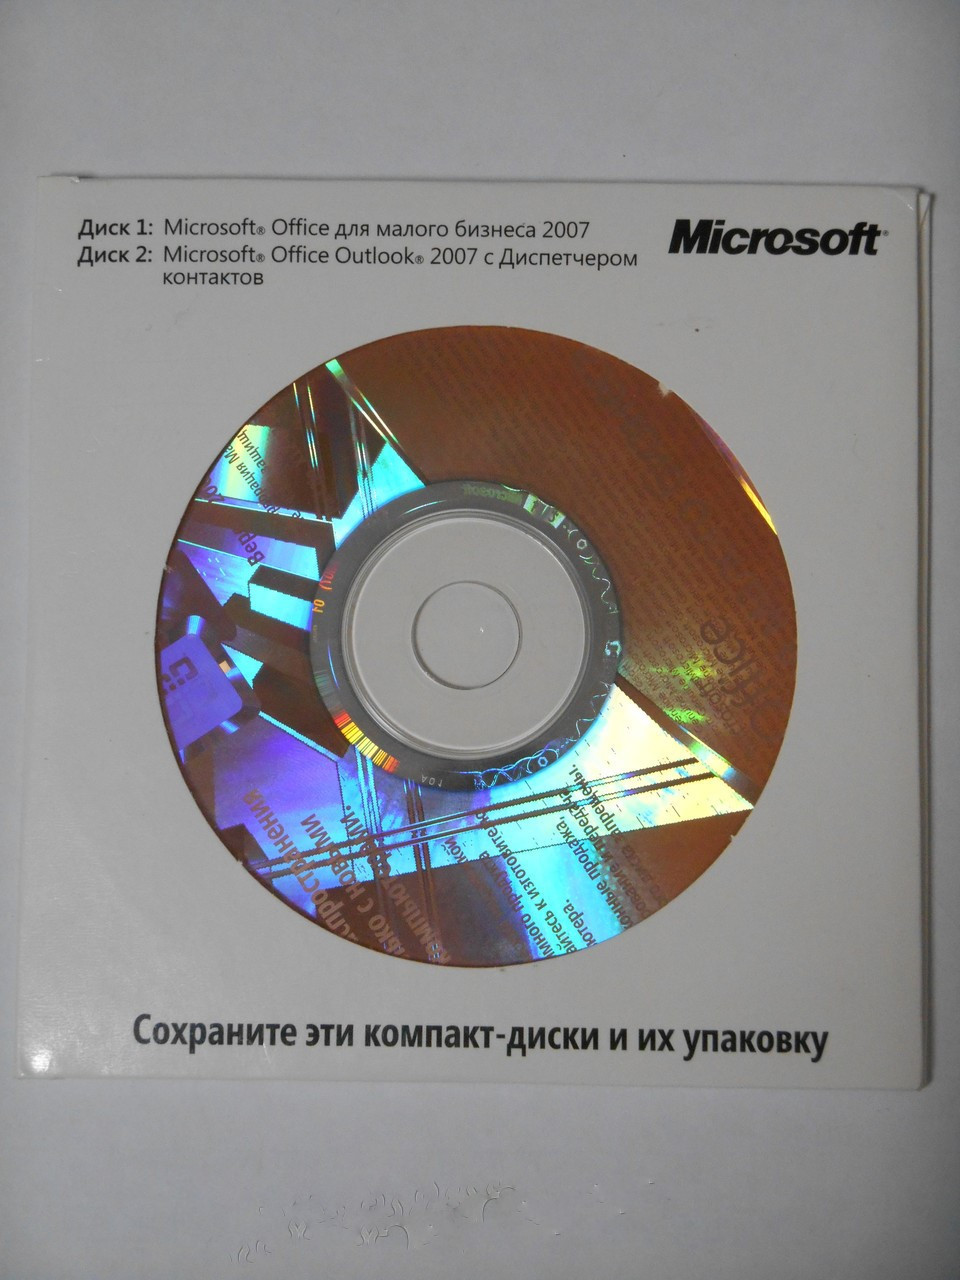 Microsoft Office 2003 Basic Edition, OEM (S55-00640)